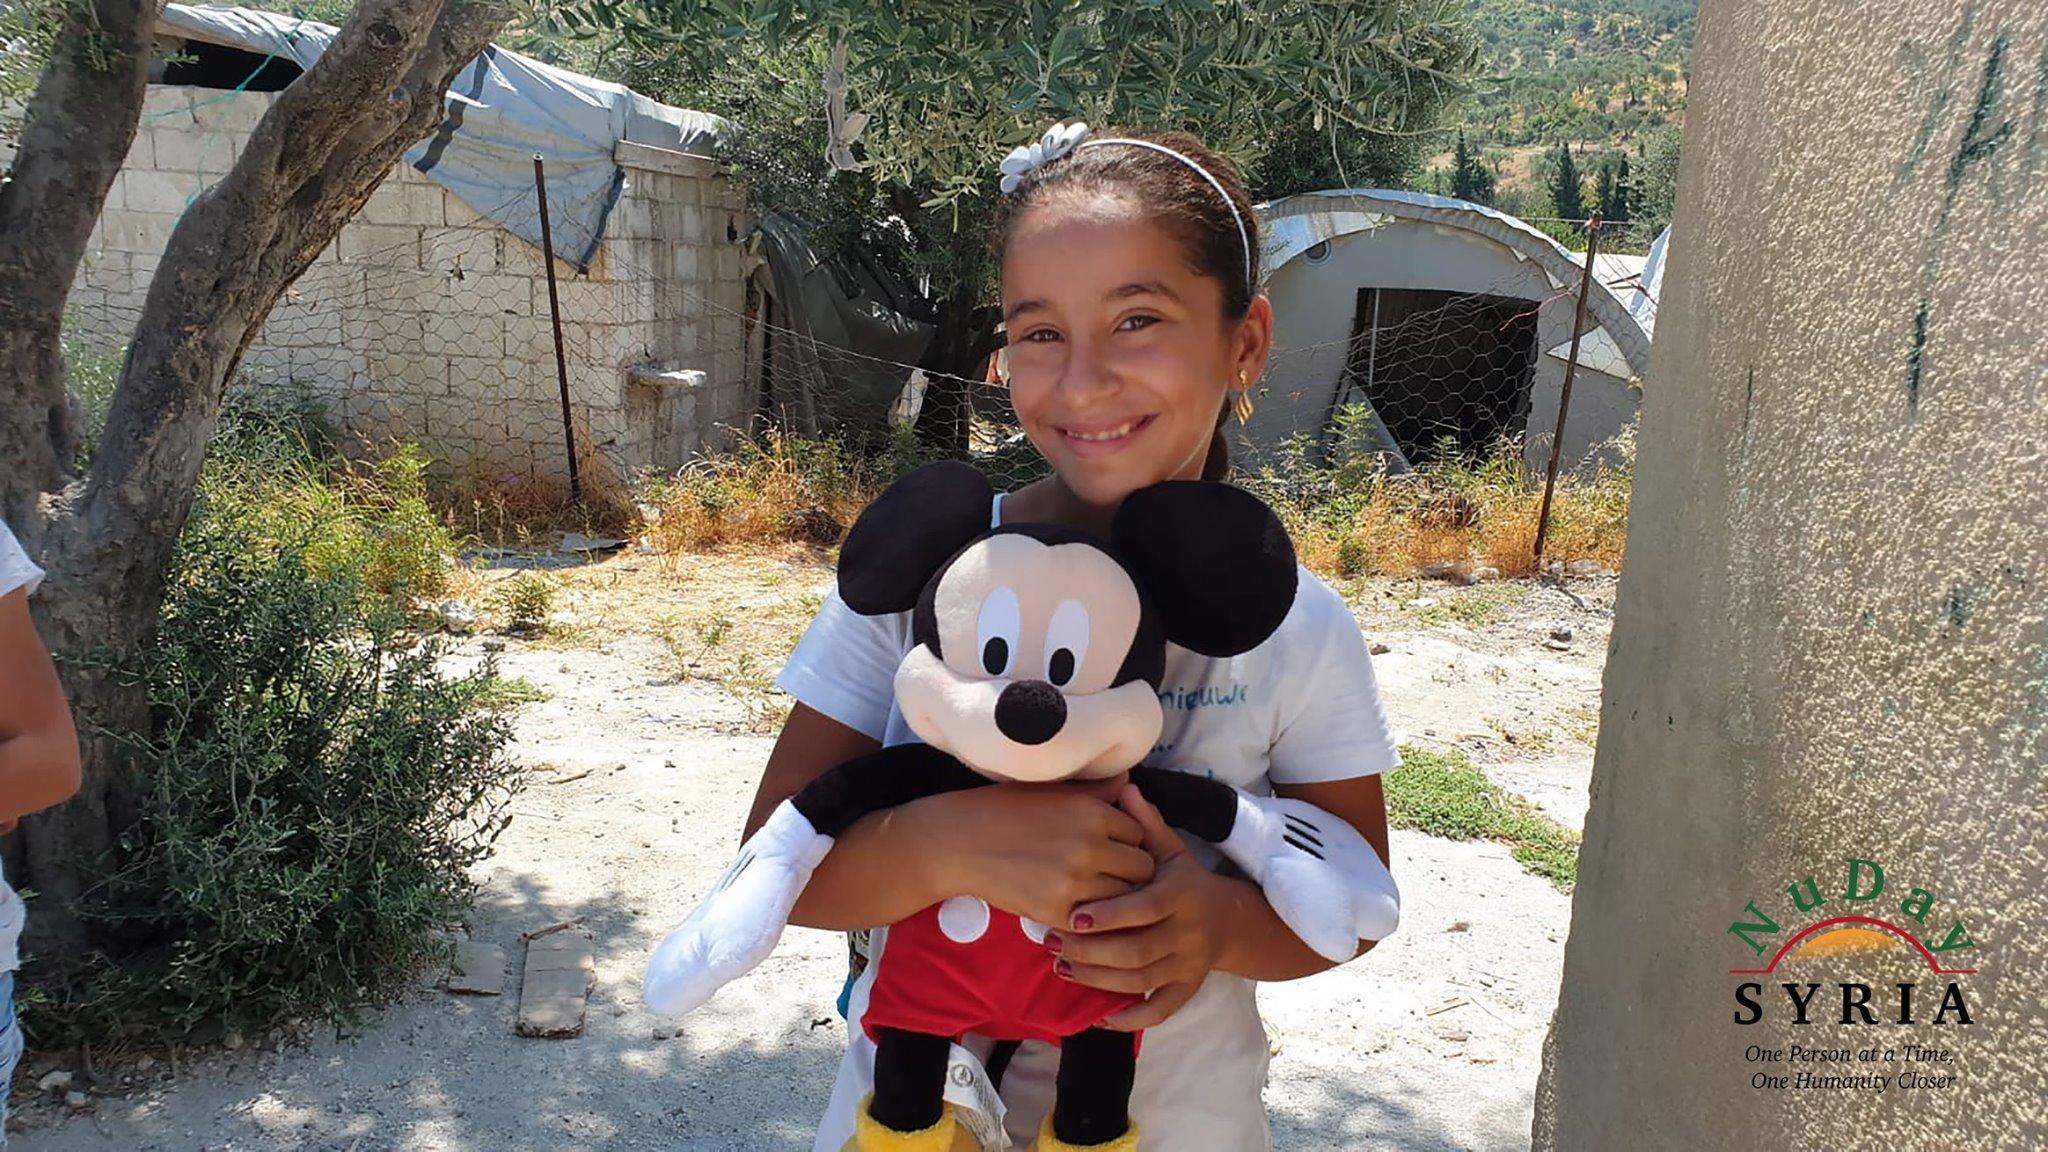 A ten year old girl hugs her Mickey Mouse teddy bear.